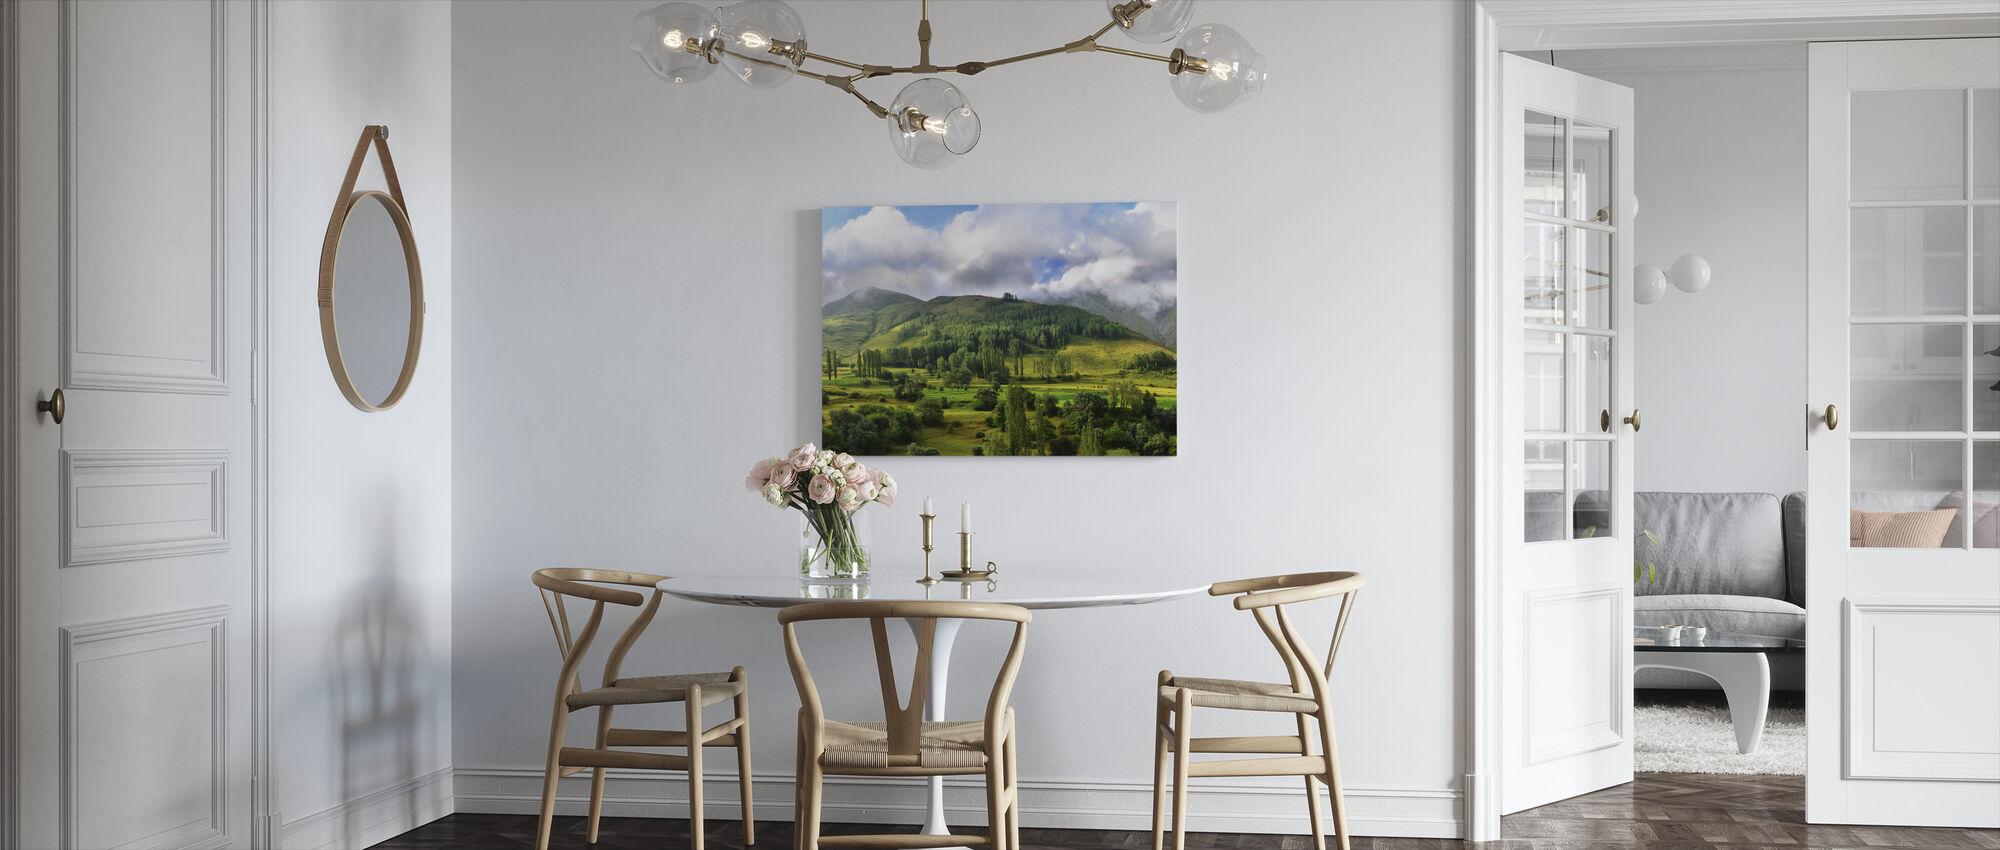 Hooglanden - Canvas print - Keuken